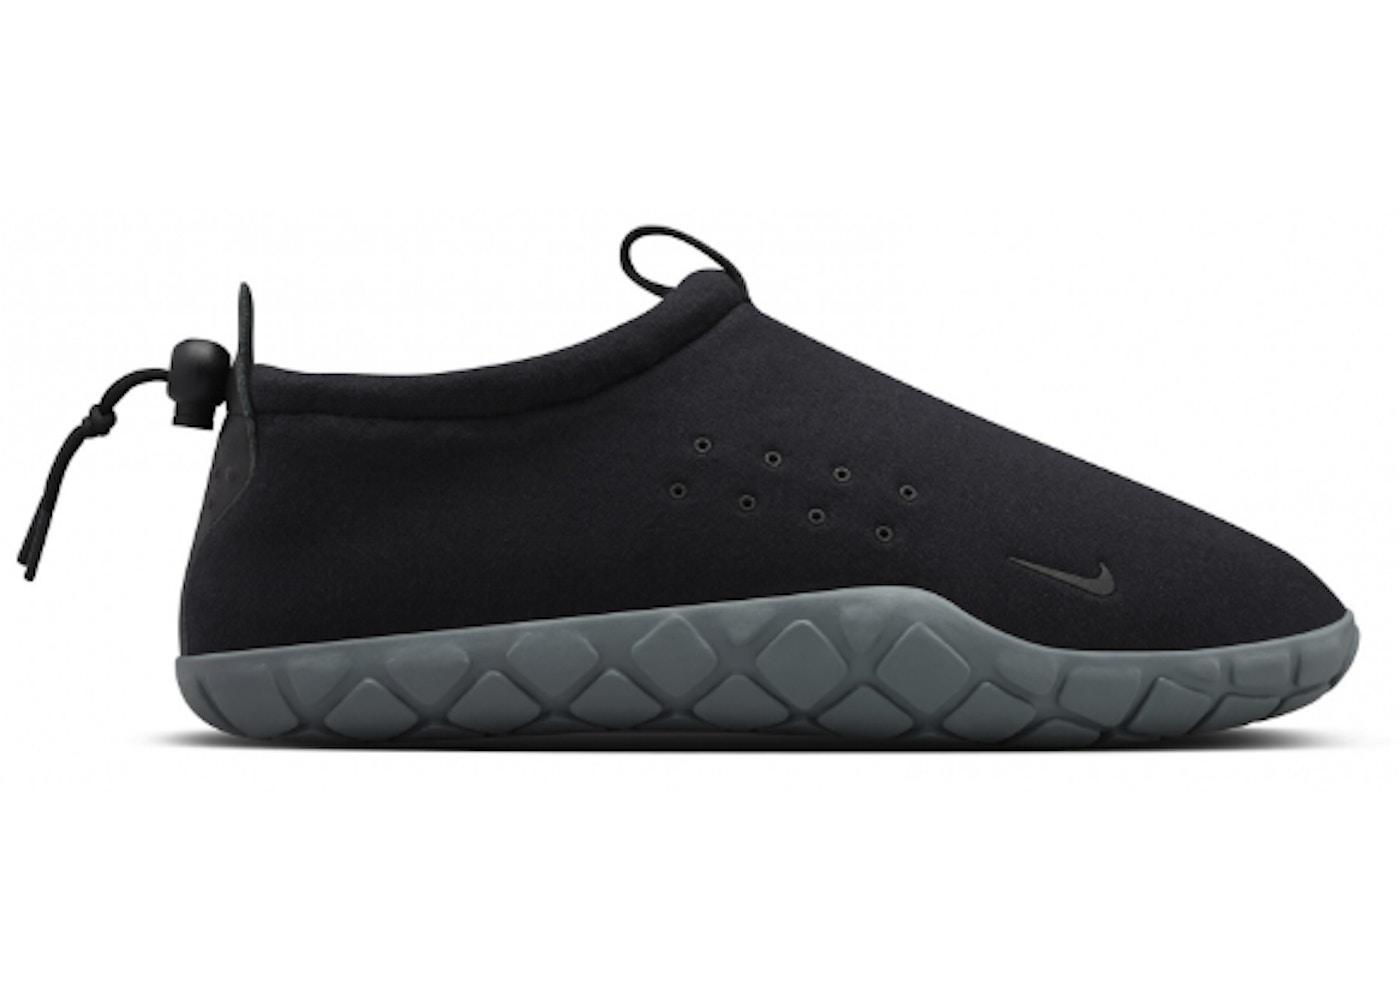 d4deea042e16 HypeAnalyzer · Nike Air Moc Tech Fleece Black